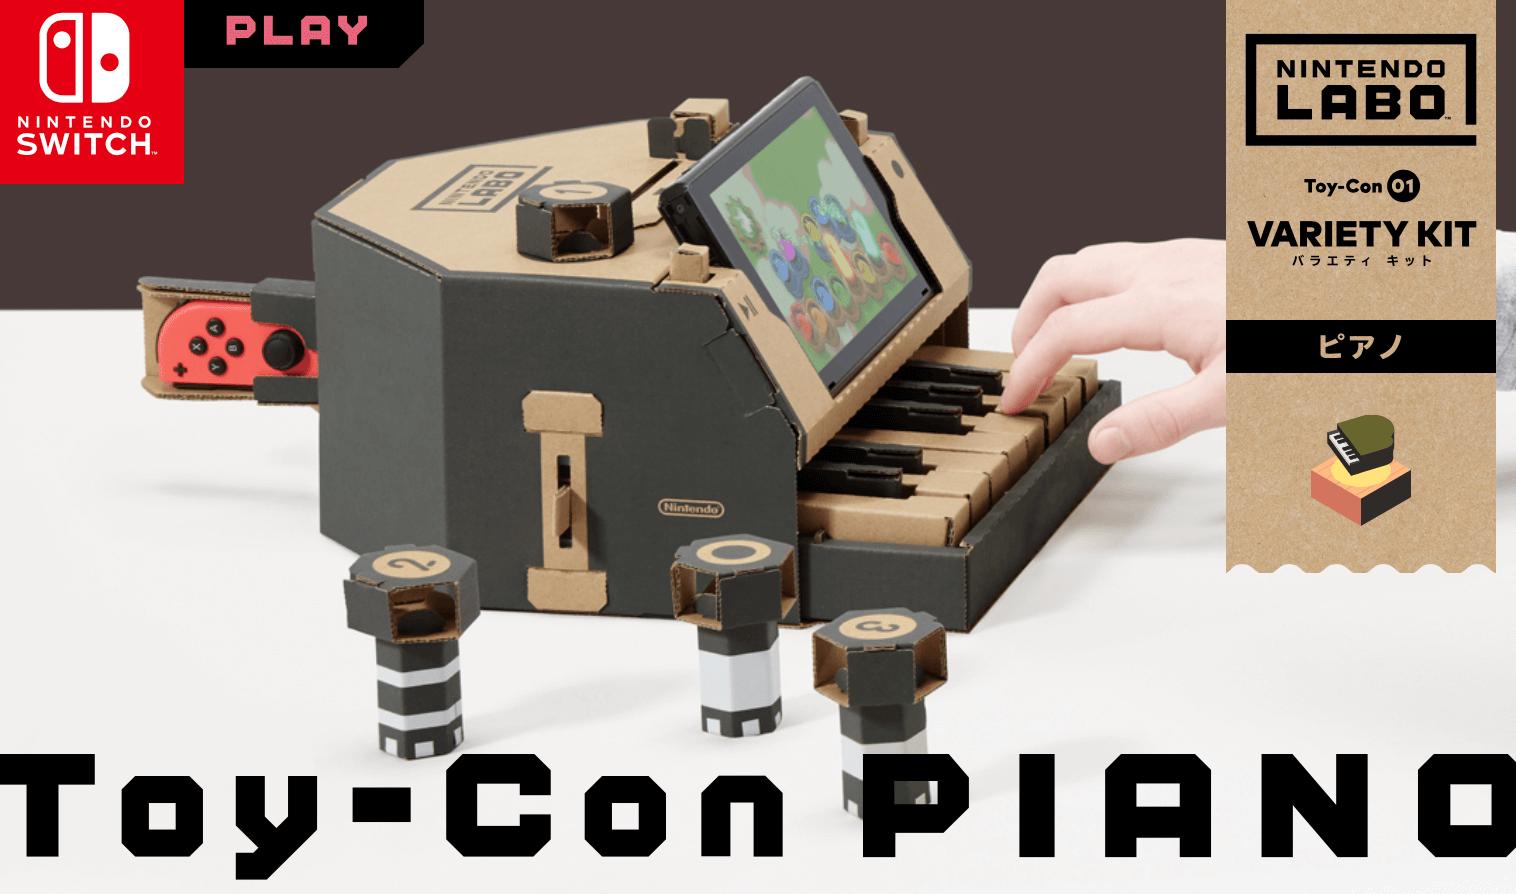 Nintendo Labo Variety Kitのピアノ画像